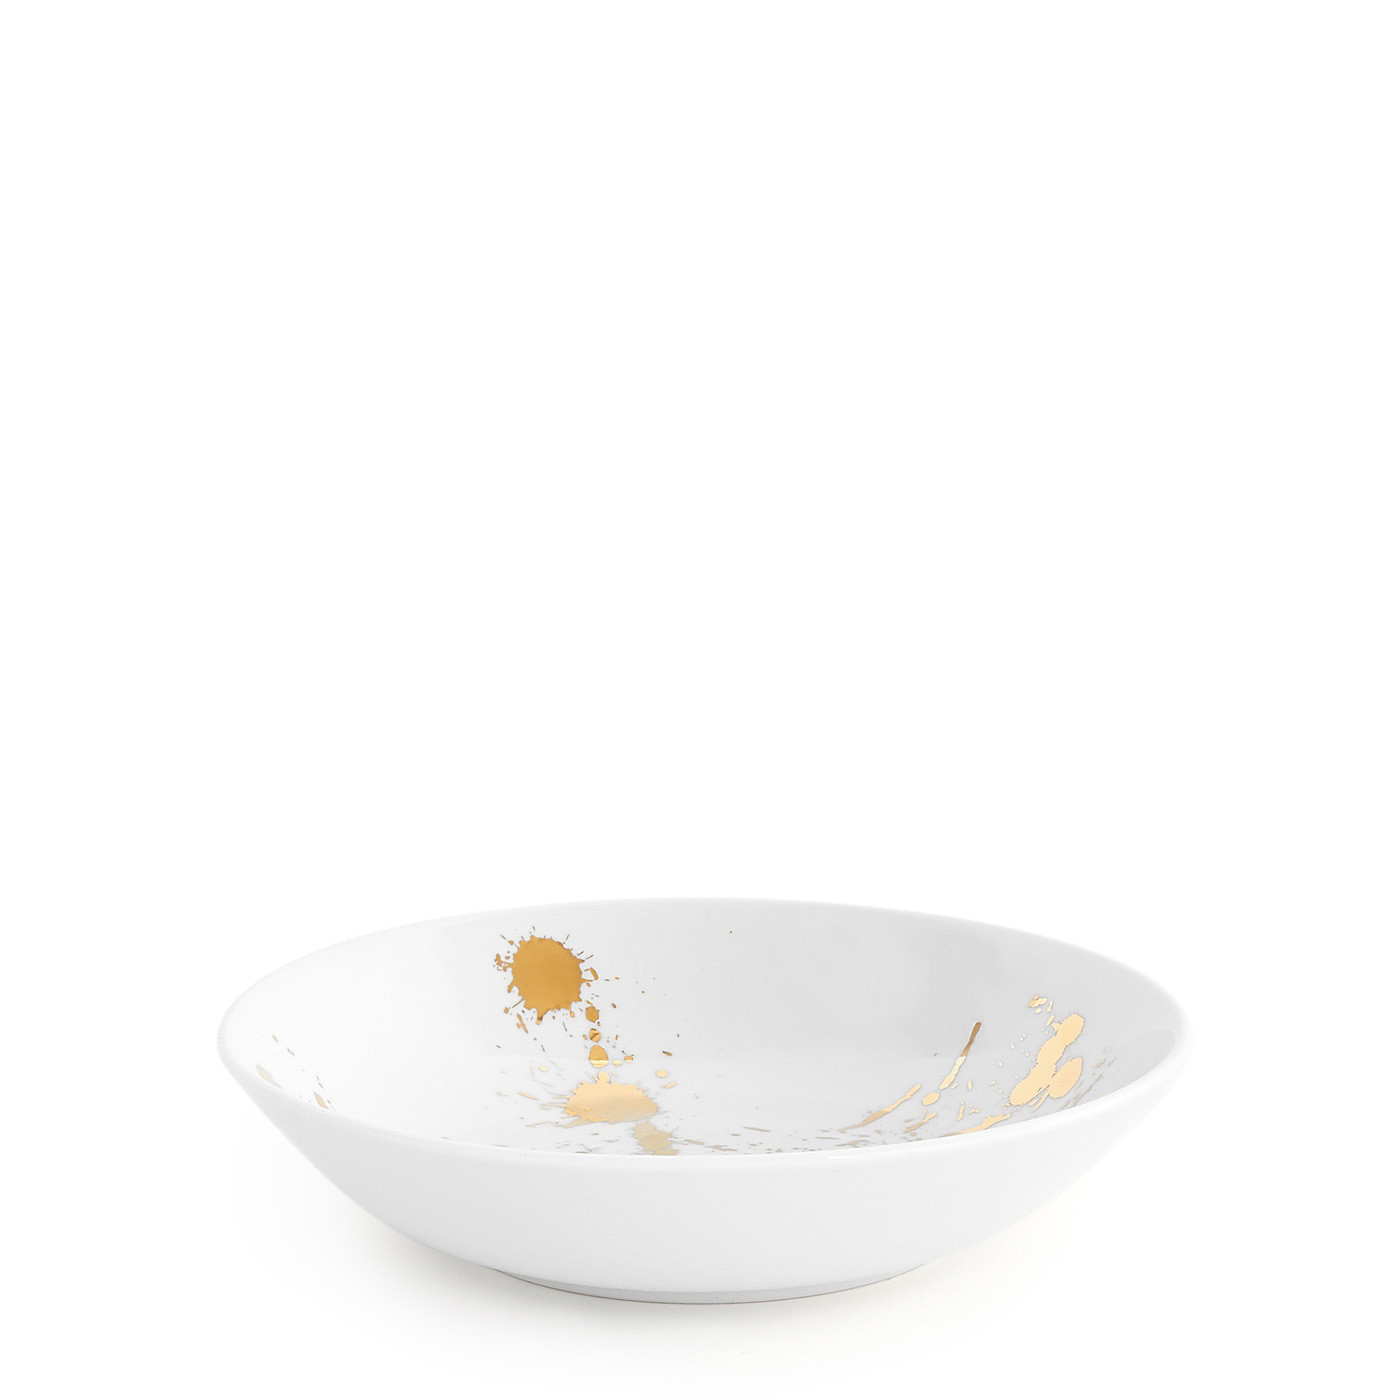 Jonathan Adler 1948 White and Gold Soup Bowl / Set of 4